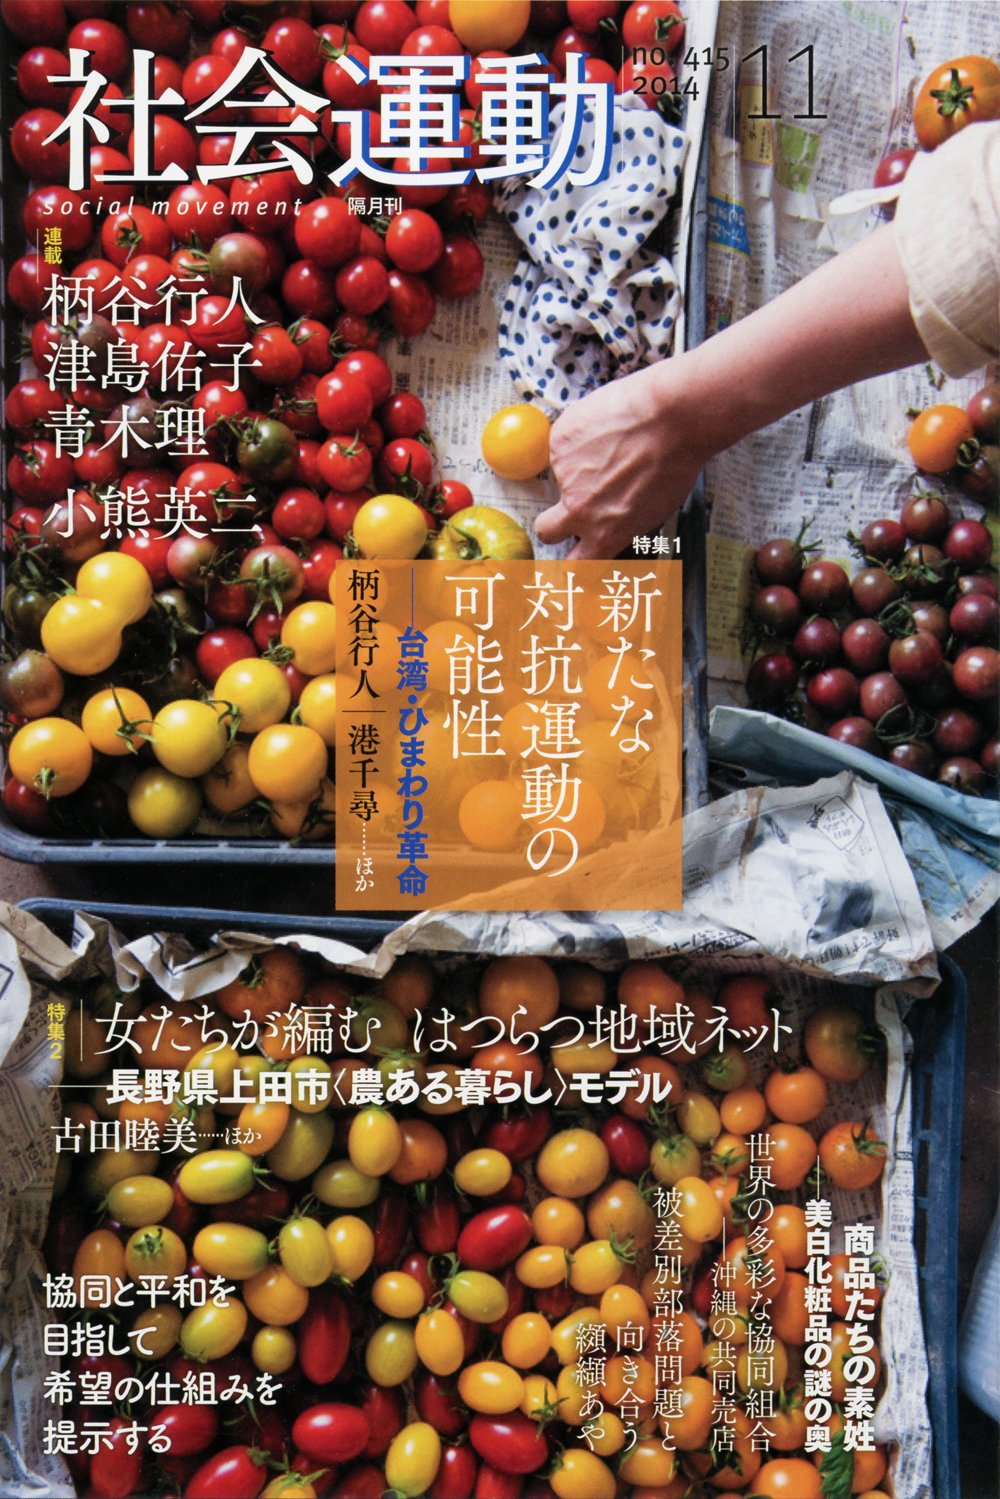 Tokushū arata na taikō undō no kanōsei : karatani kōjin oguma eiji. pdf epub